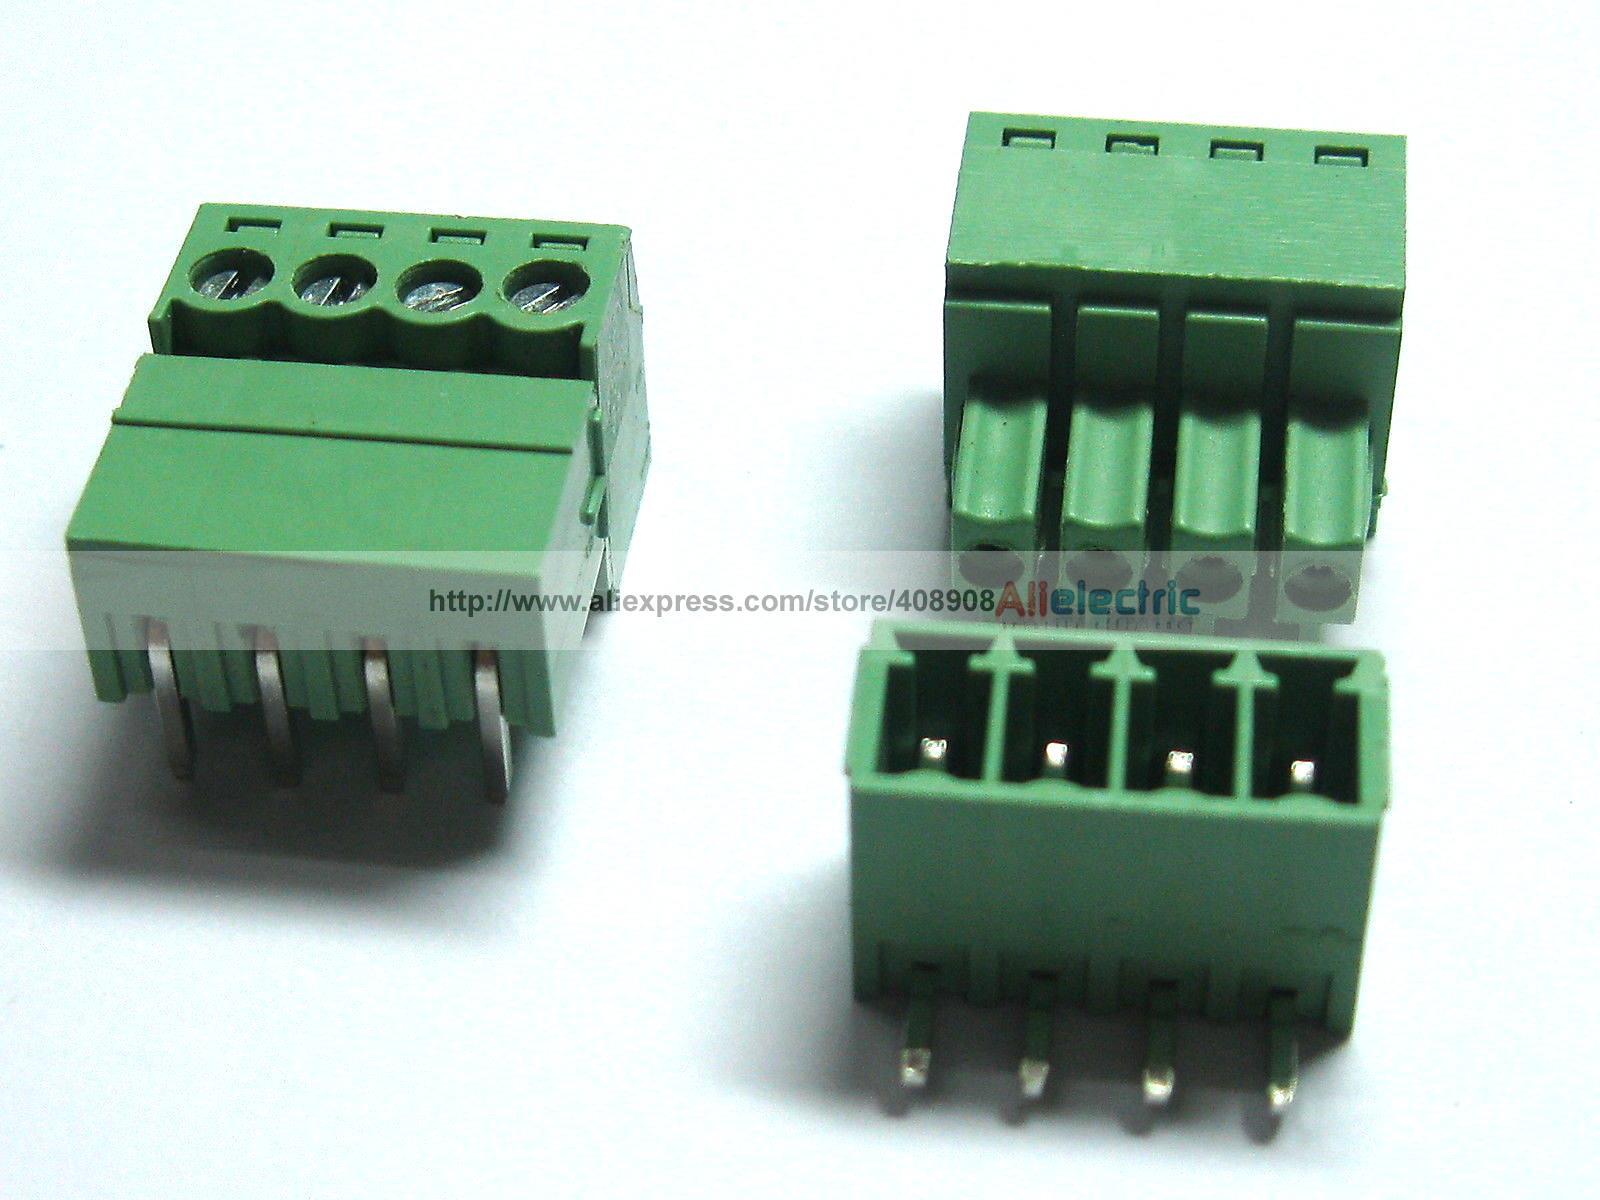 150 Pcs/lot 4pin  Screw Terminal Block Connector 3.5mm Angle 4 Pin Green Pluggable Type